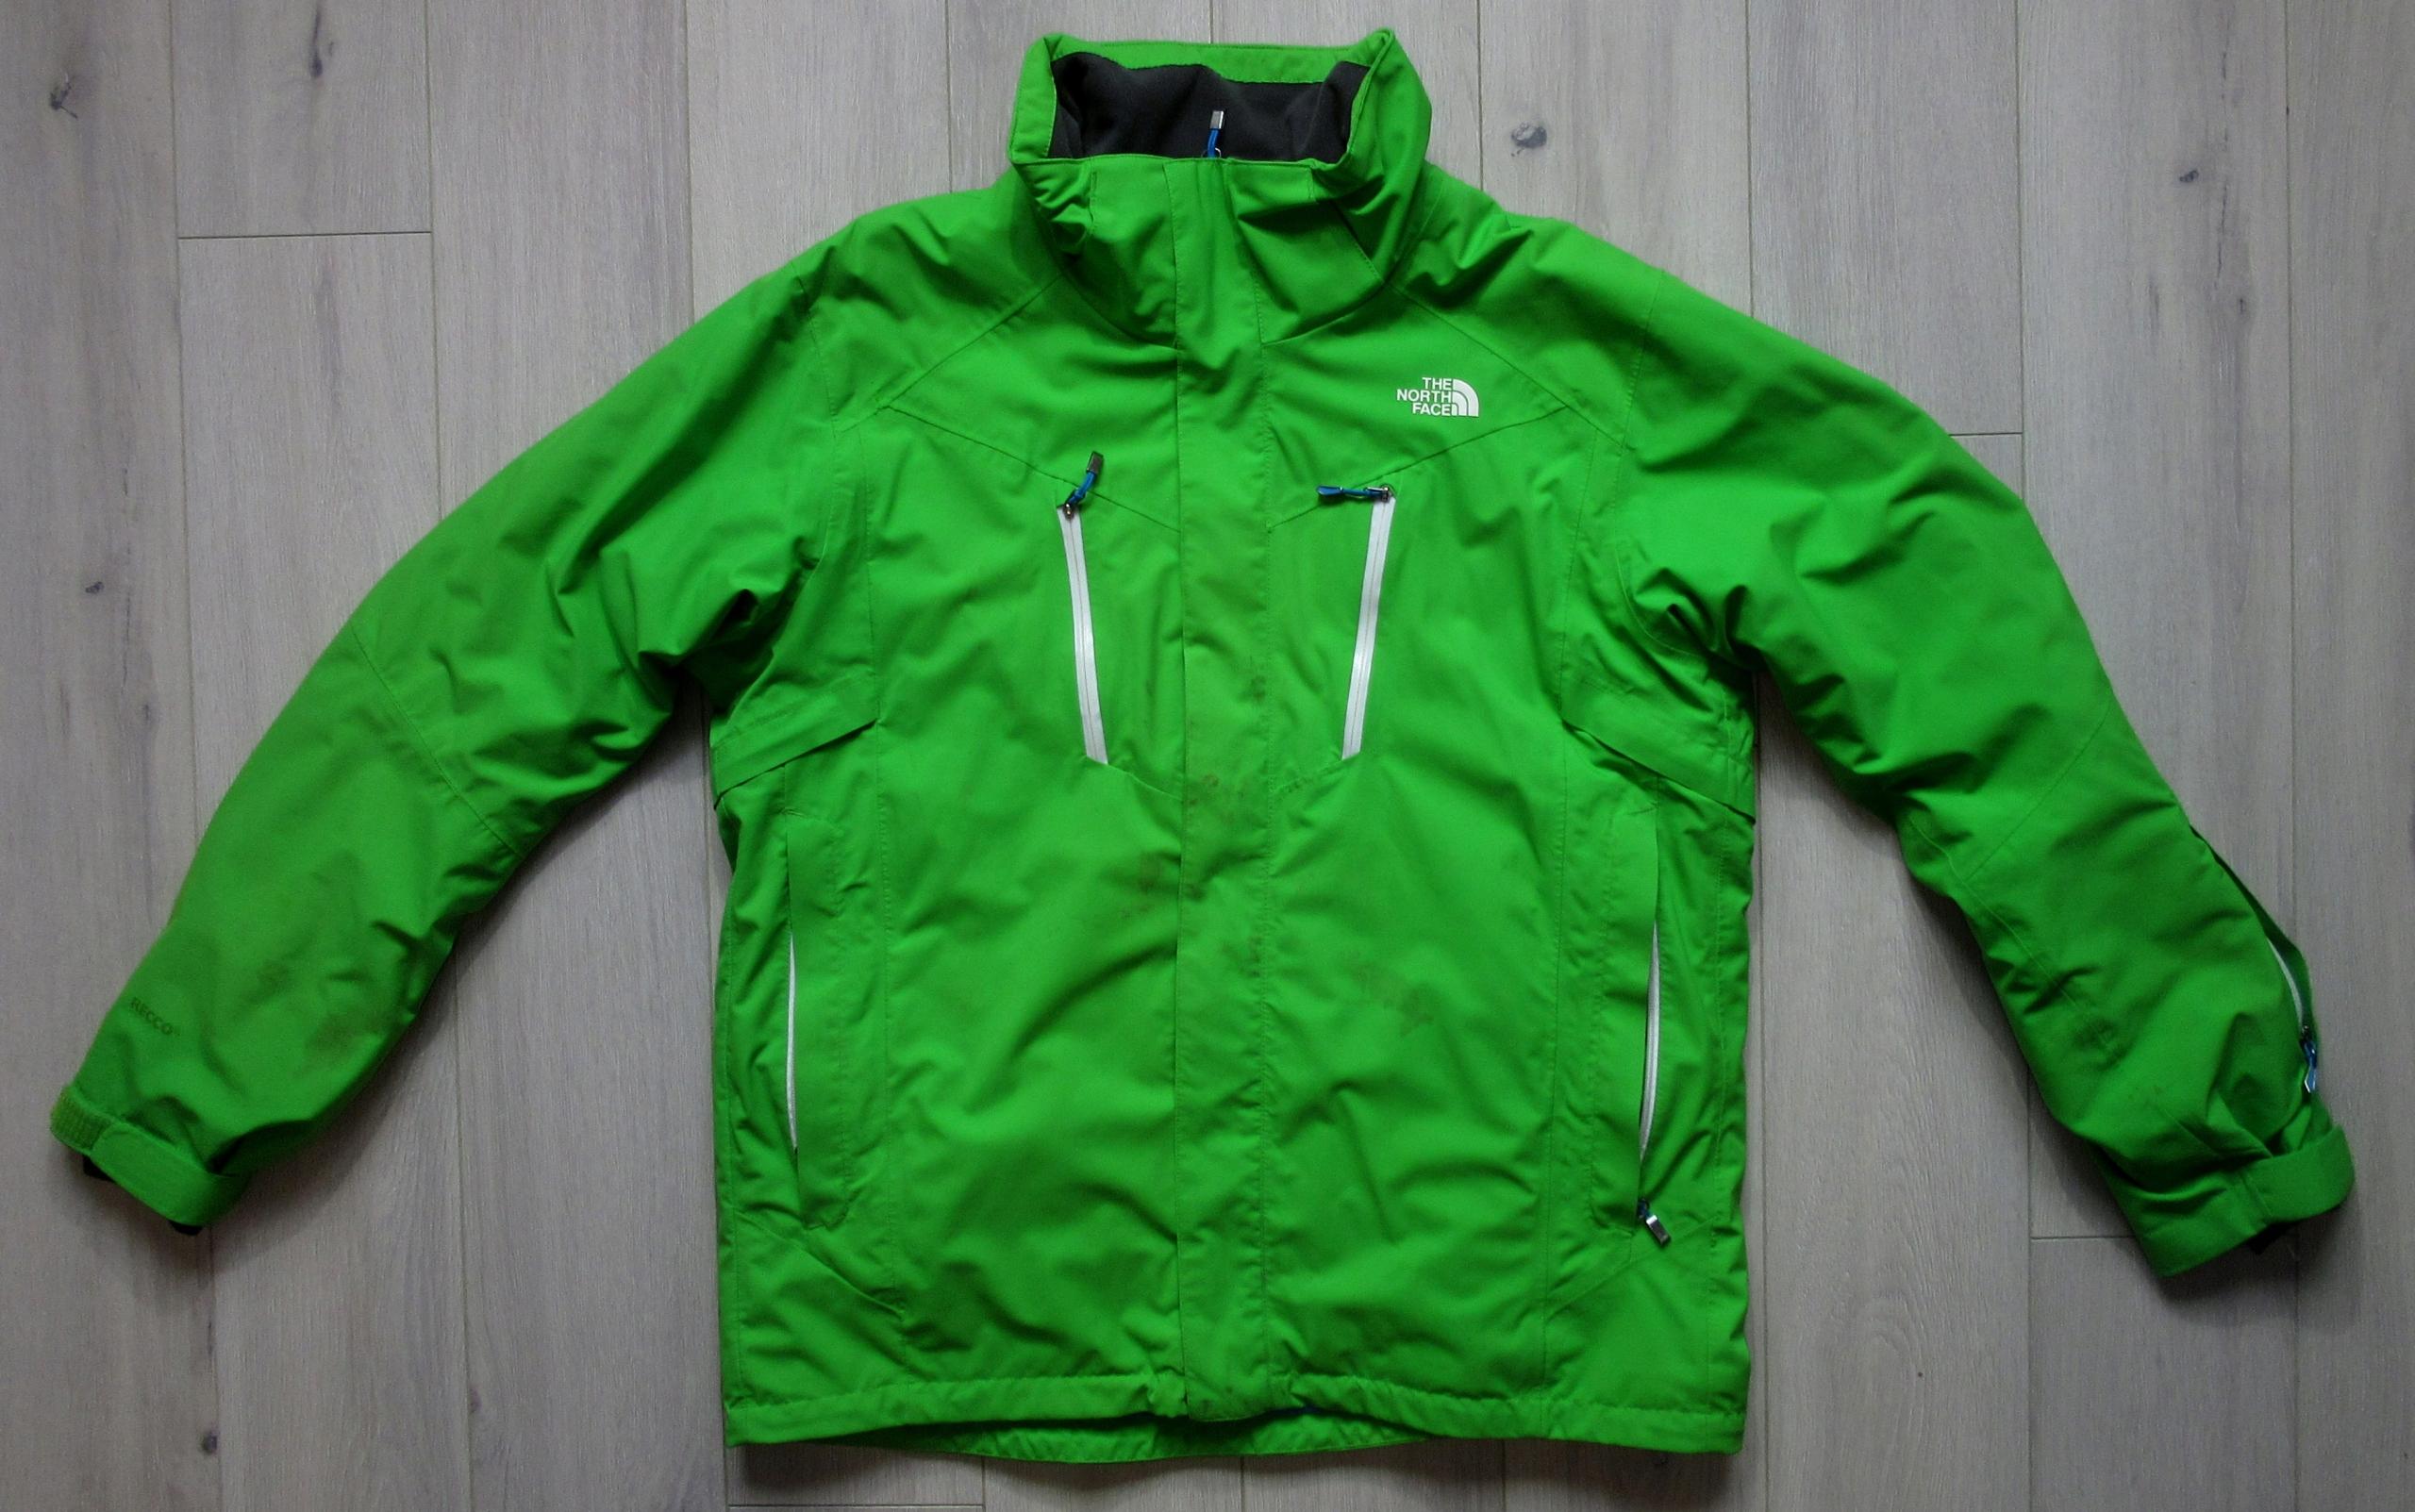 Kurtka narciarska The North Face HyVent Recco r.XL